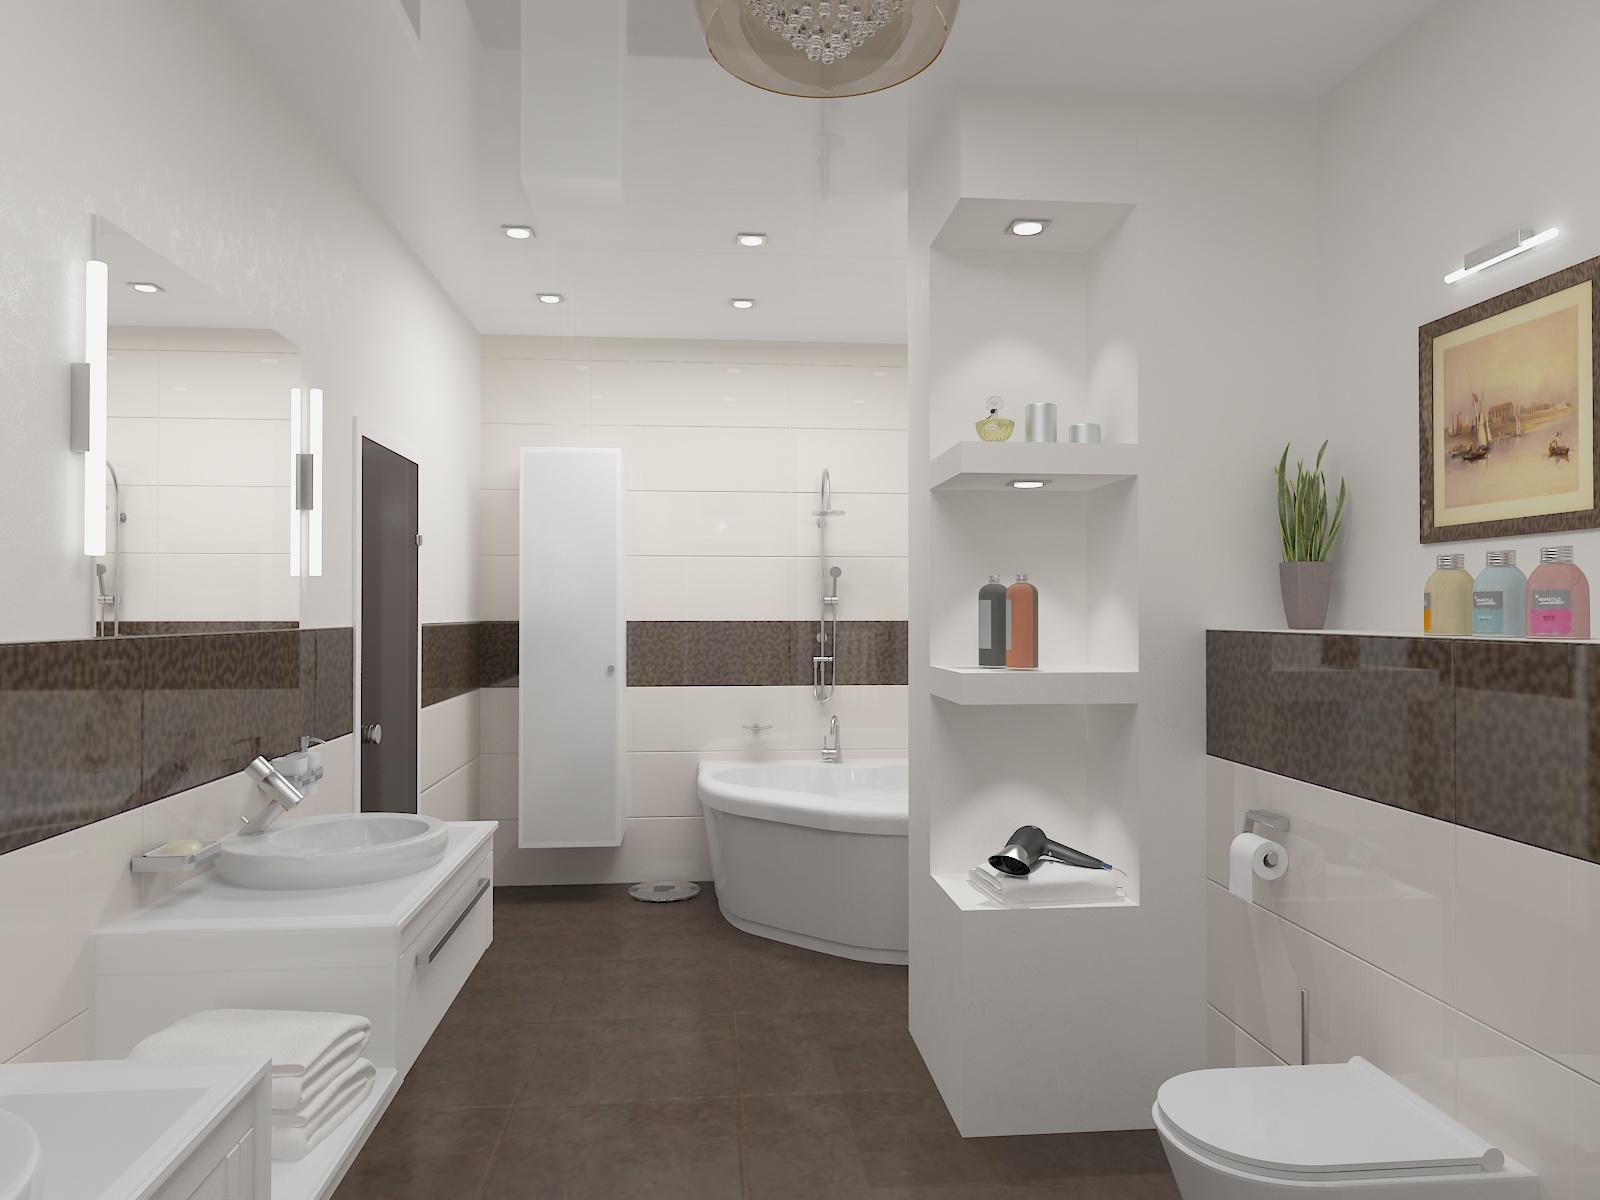 (Вариант) Квартира по адресу Салтыкова-Щедрина. Сан узел и ванна Светлые тона